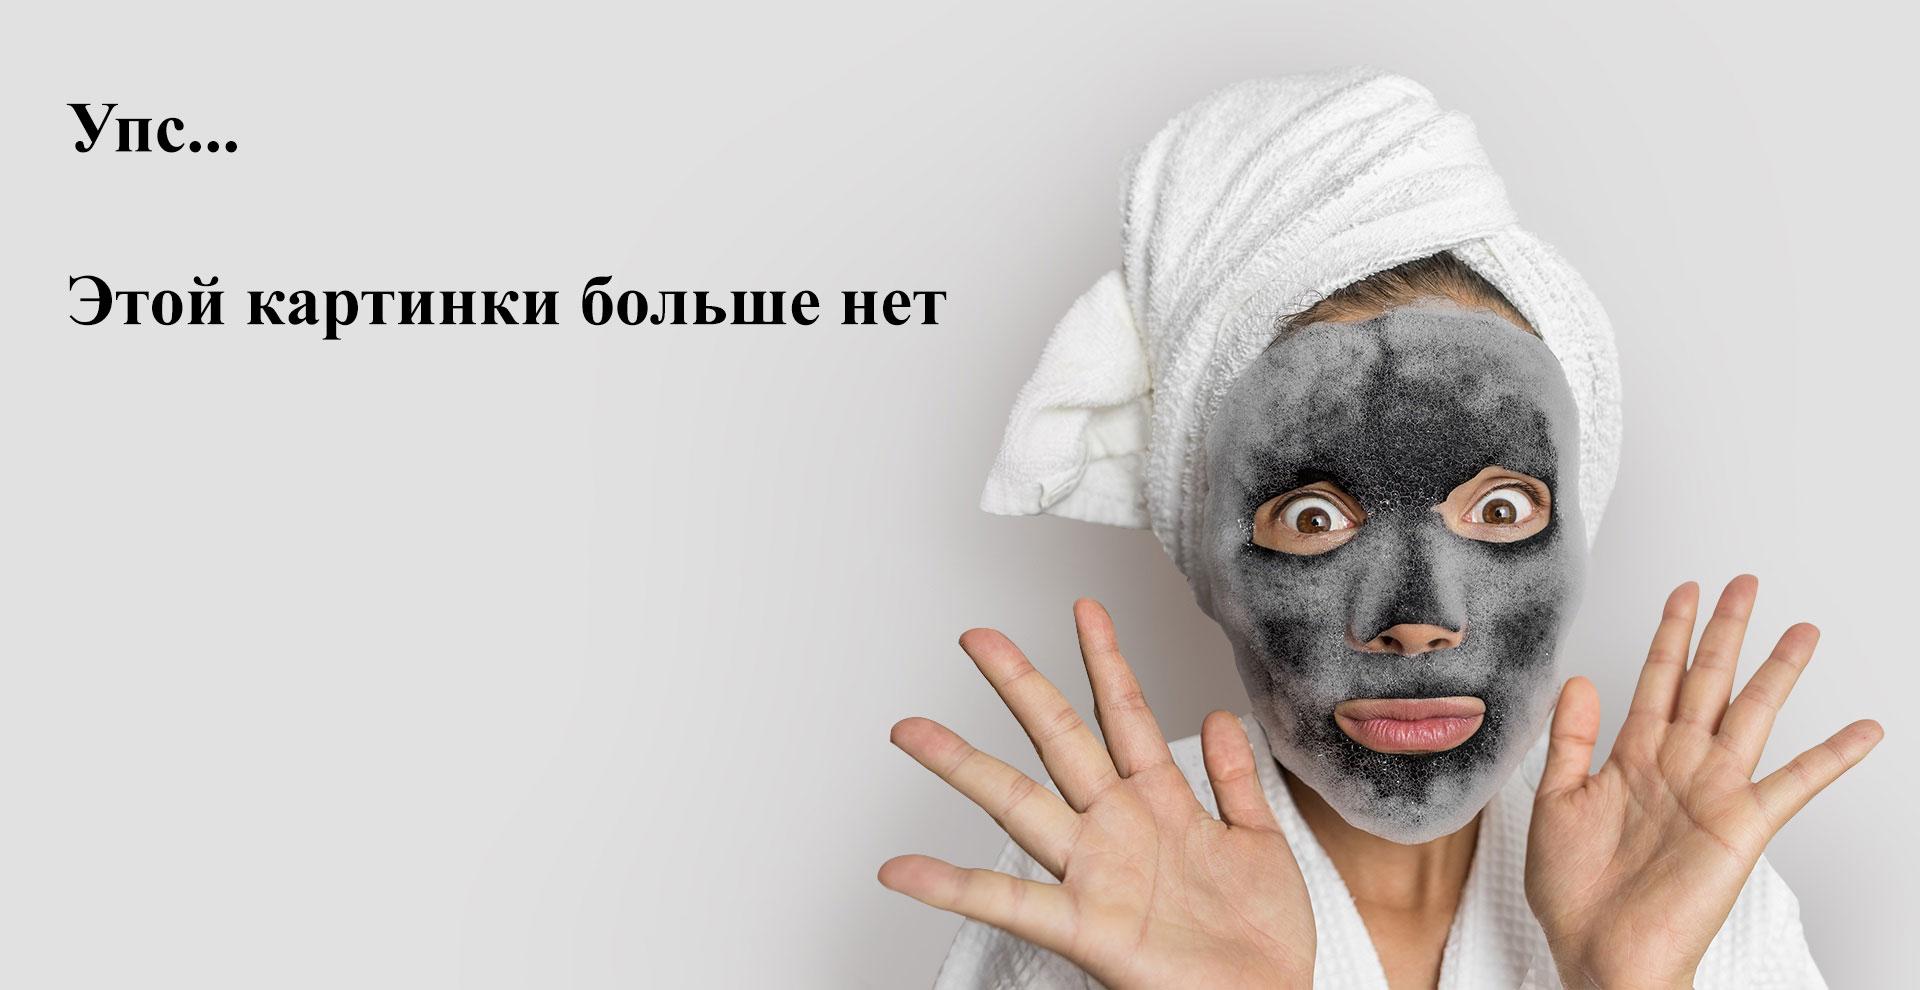 Patrisa Nail, Гель-лак Московская сага №741